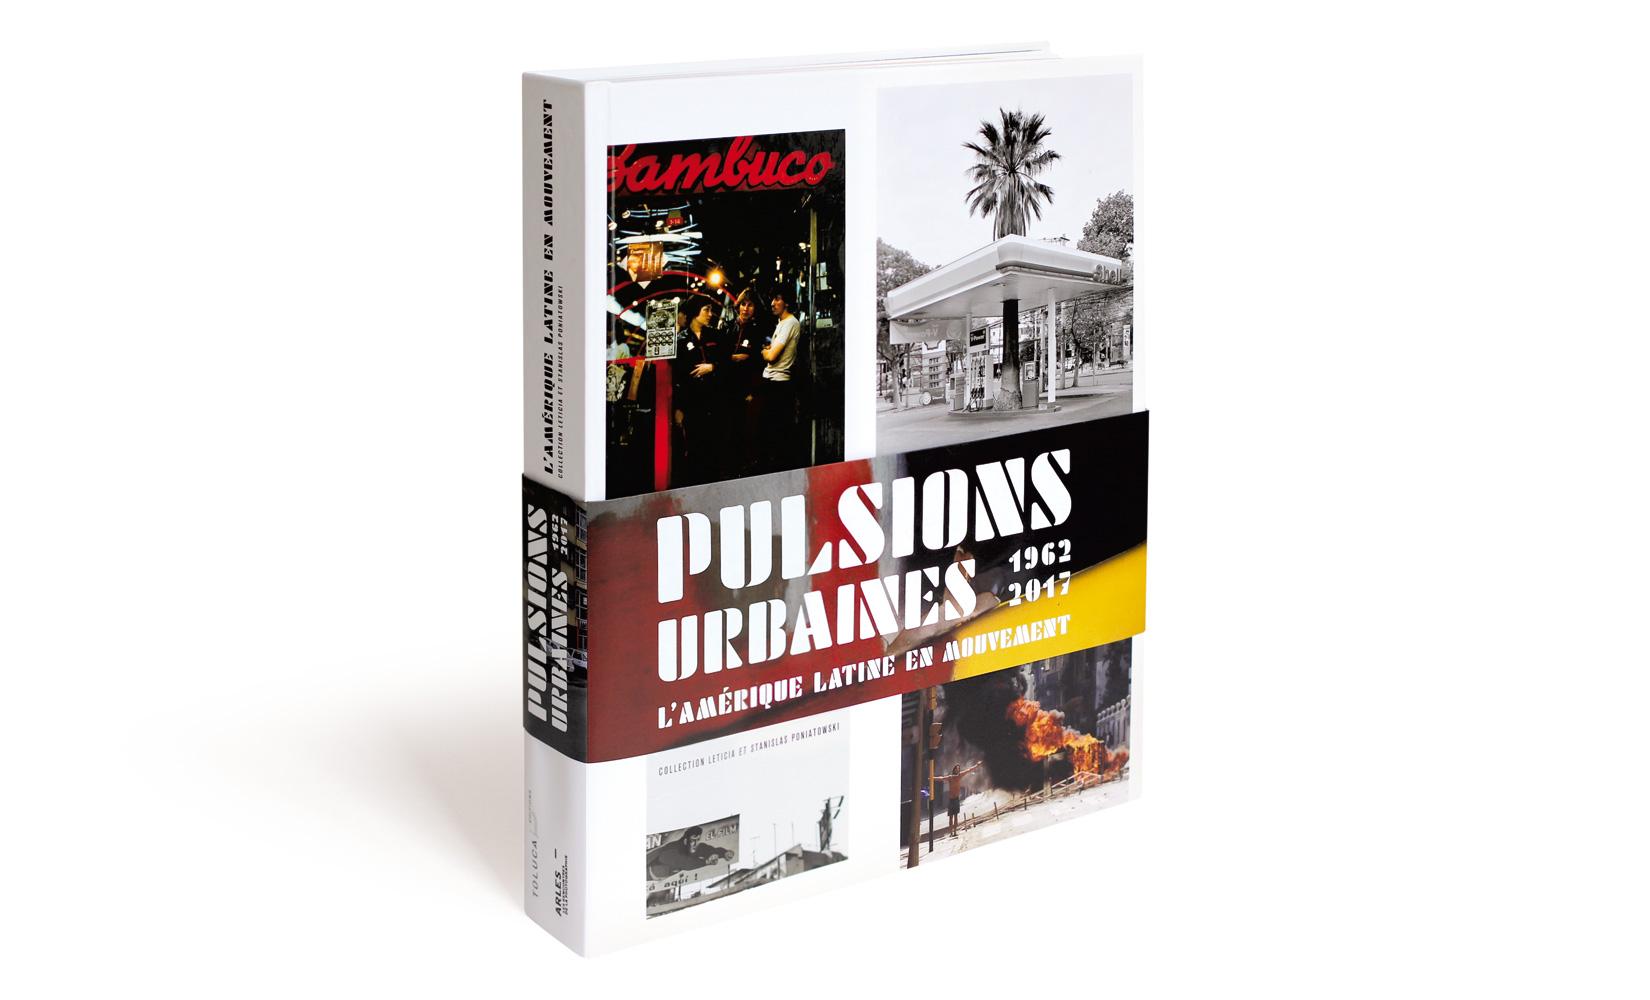 olivier-andreotti-pulsions-urbaines-02.jpg